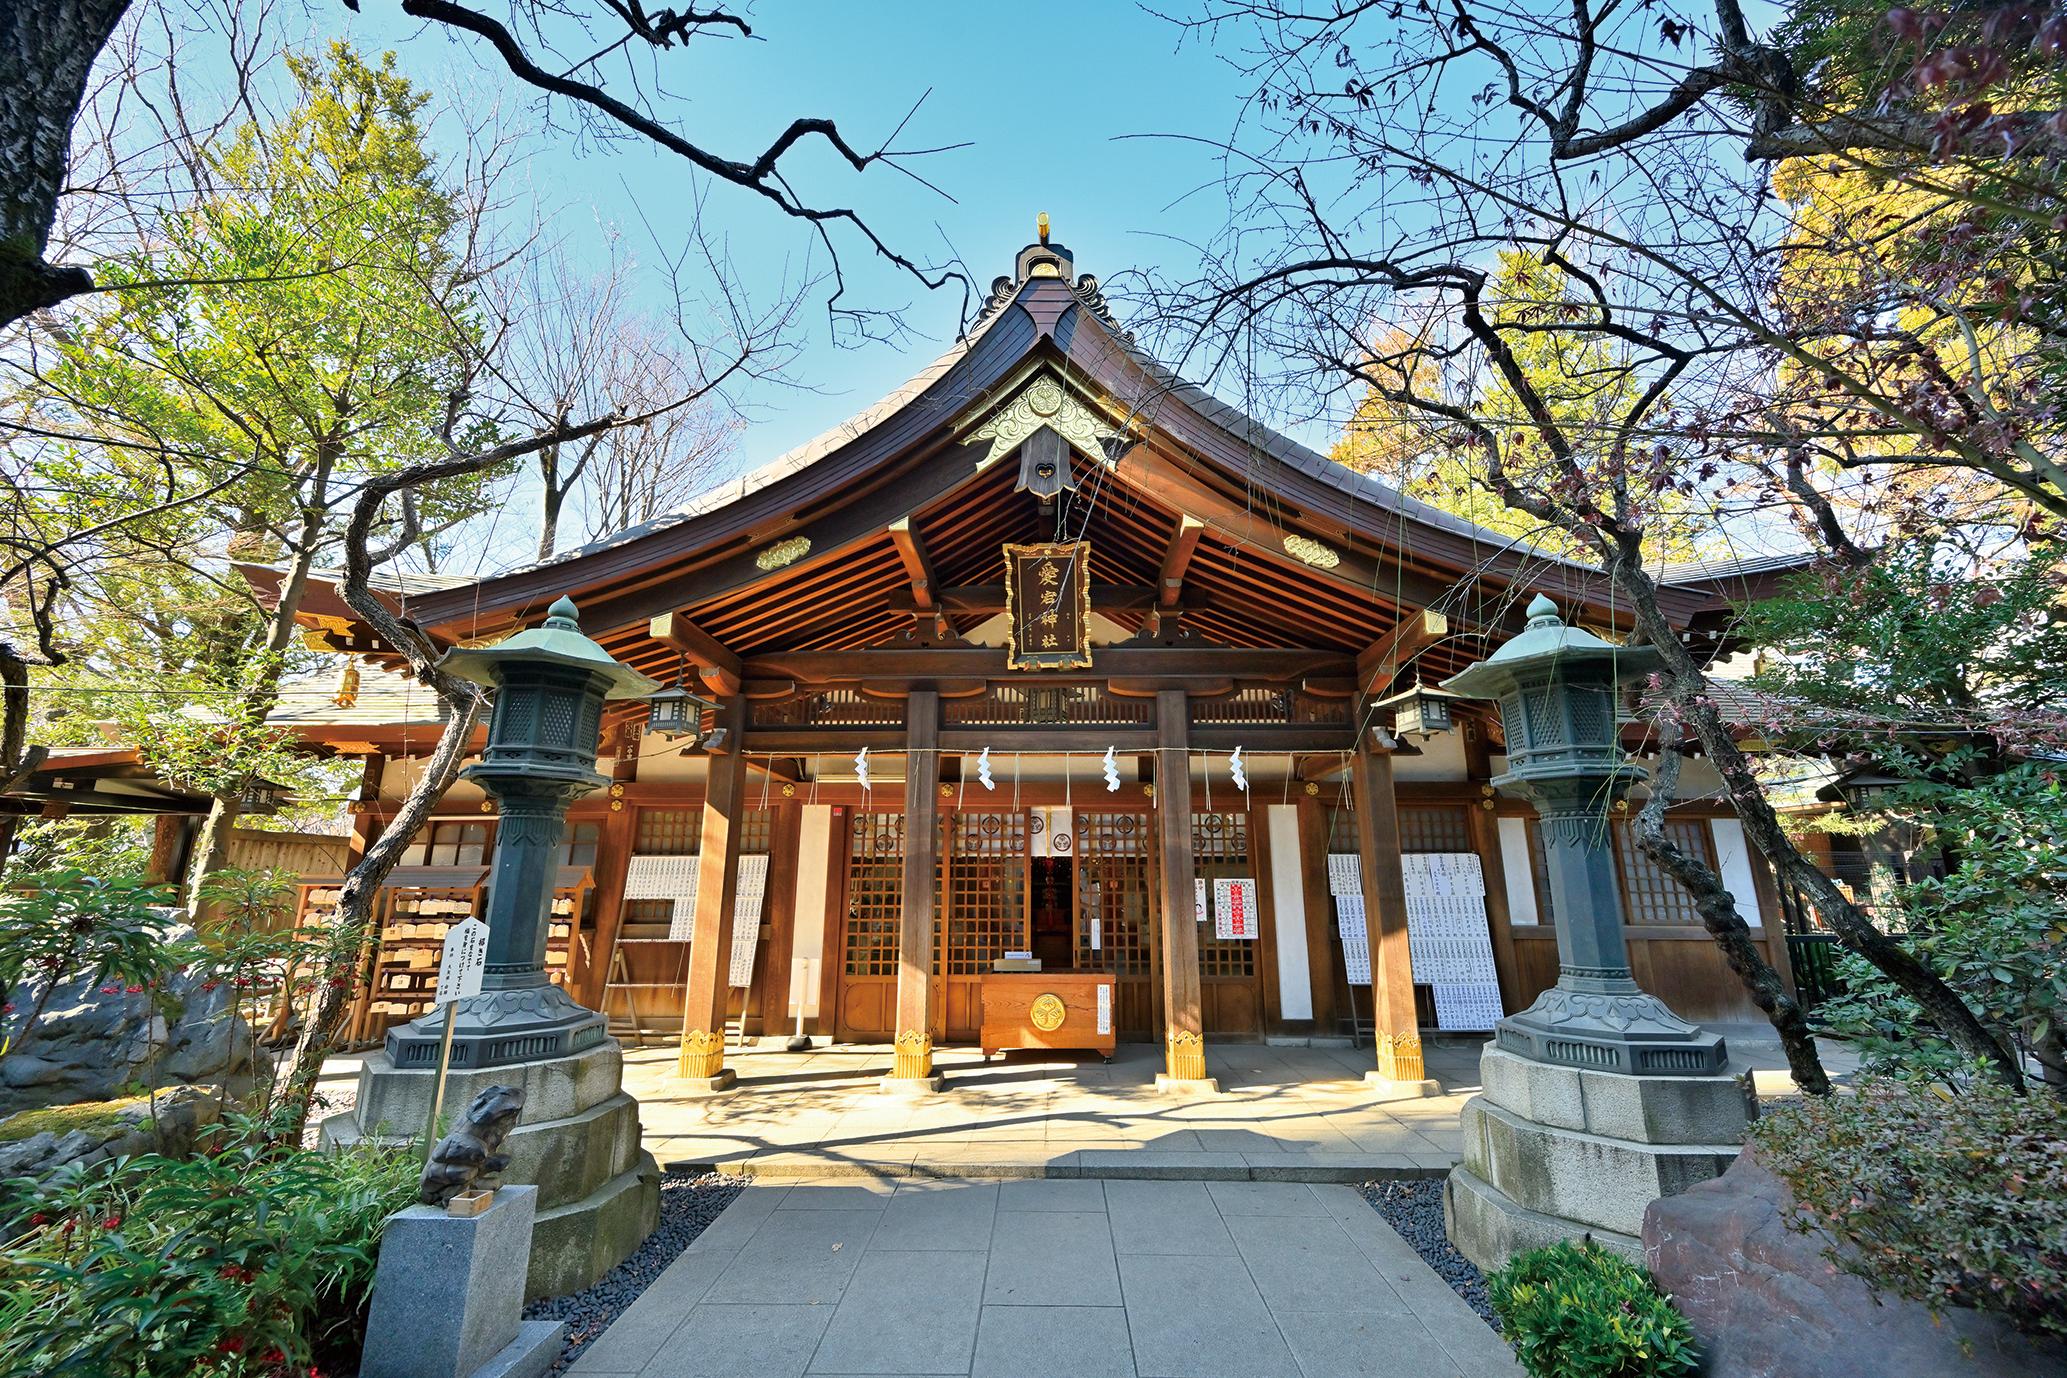 港区ー祈りの聖地 今昔STORY 第6回 愛宕神社